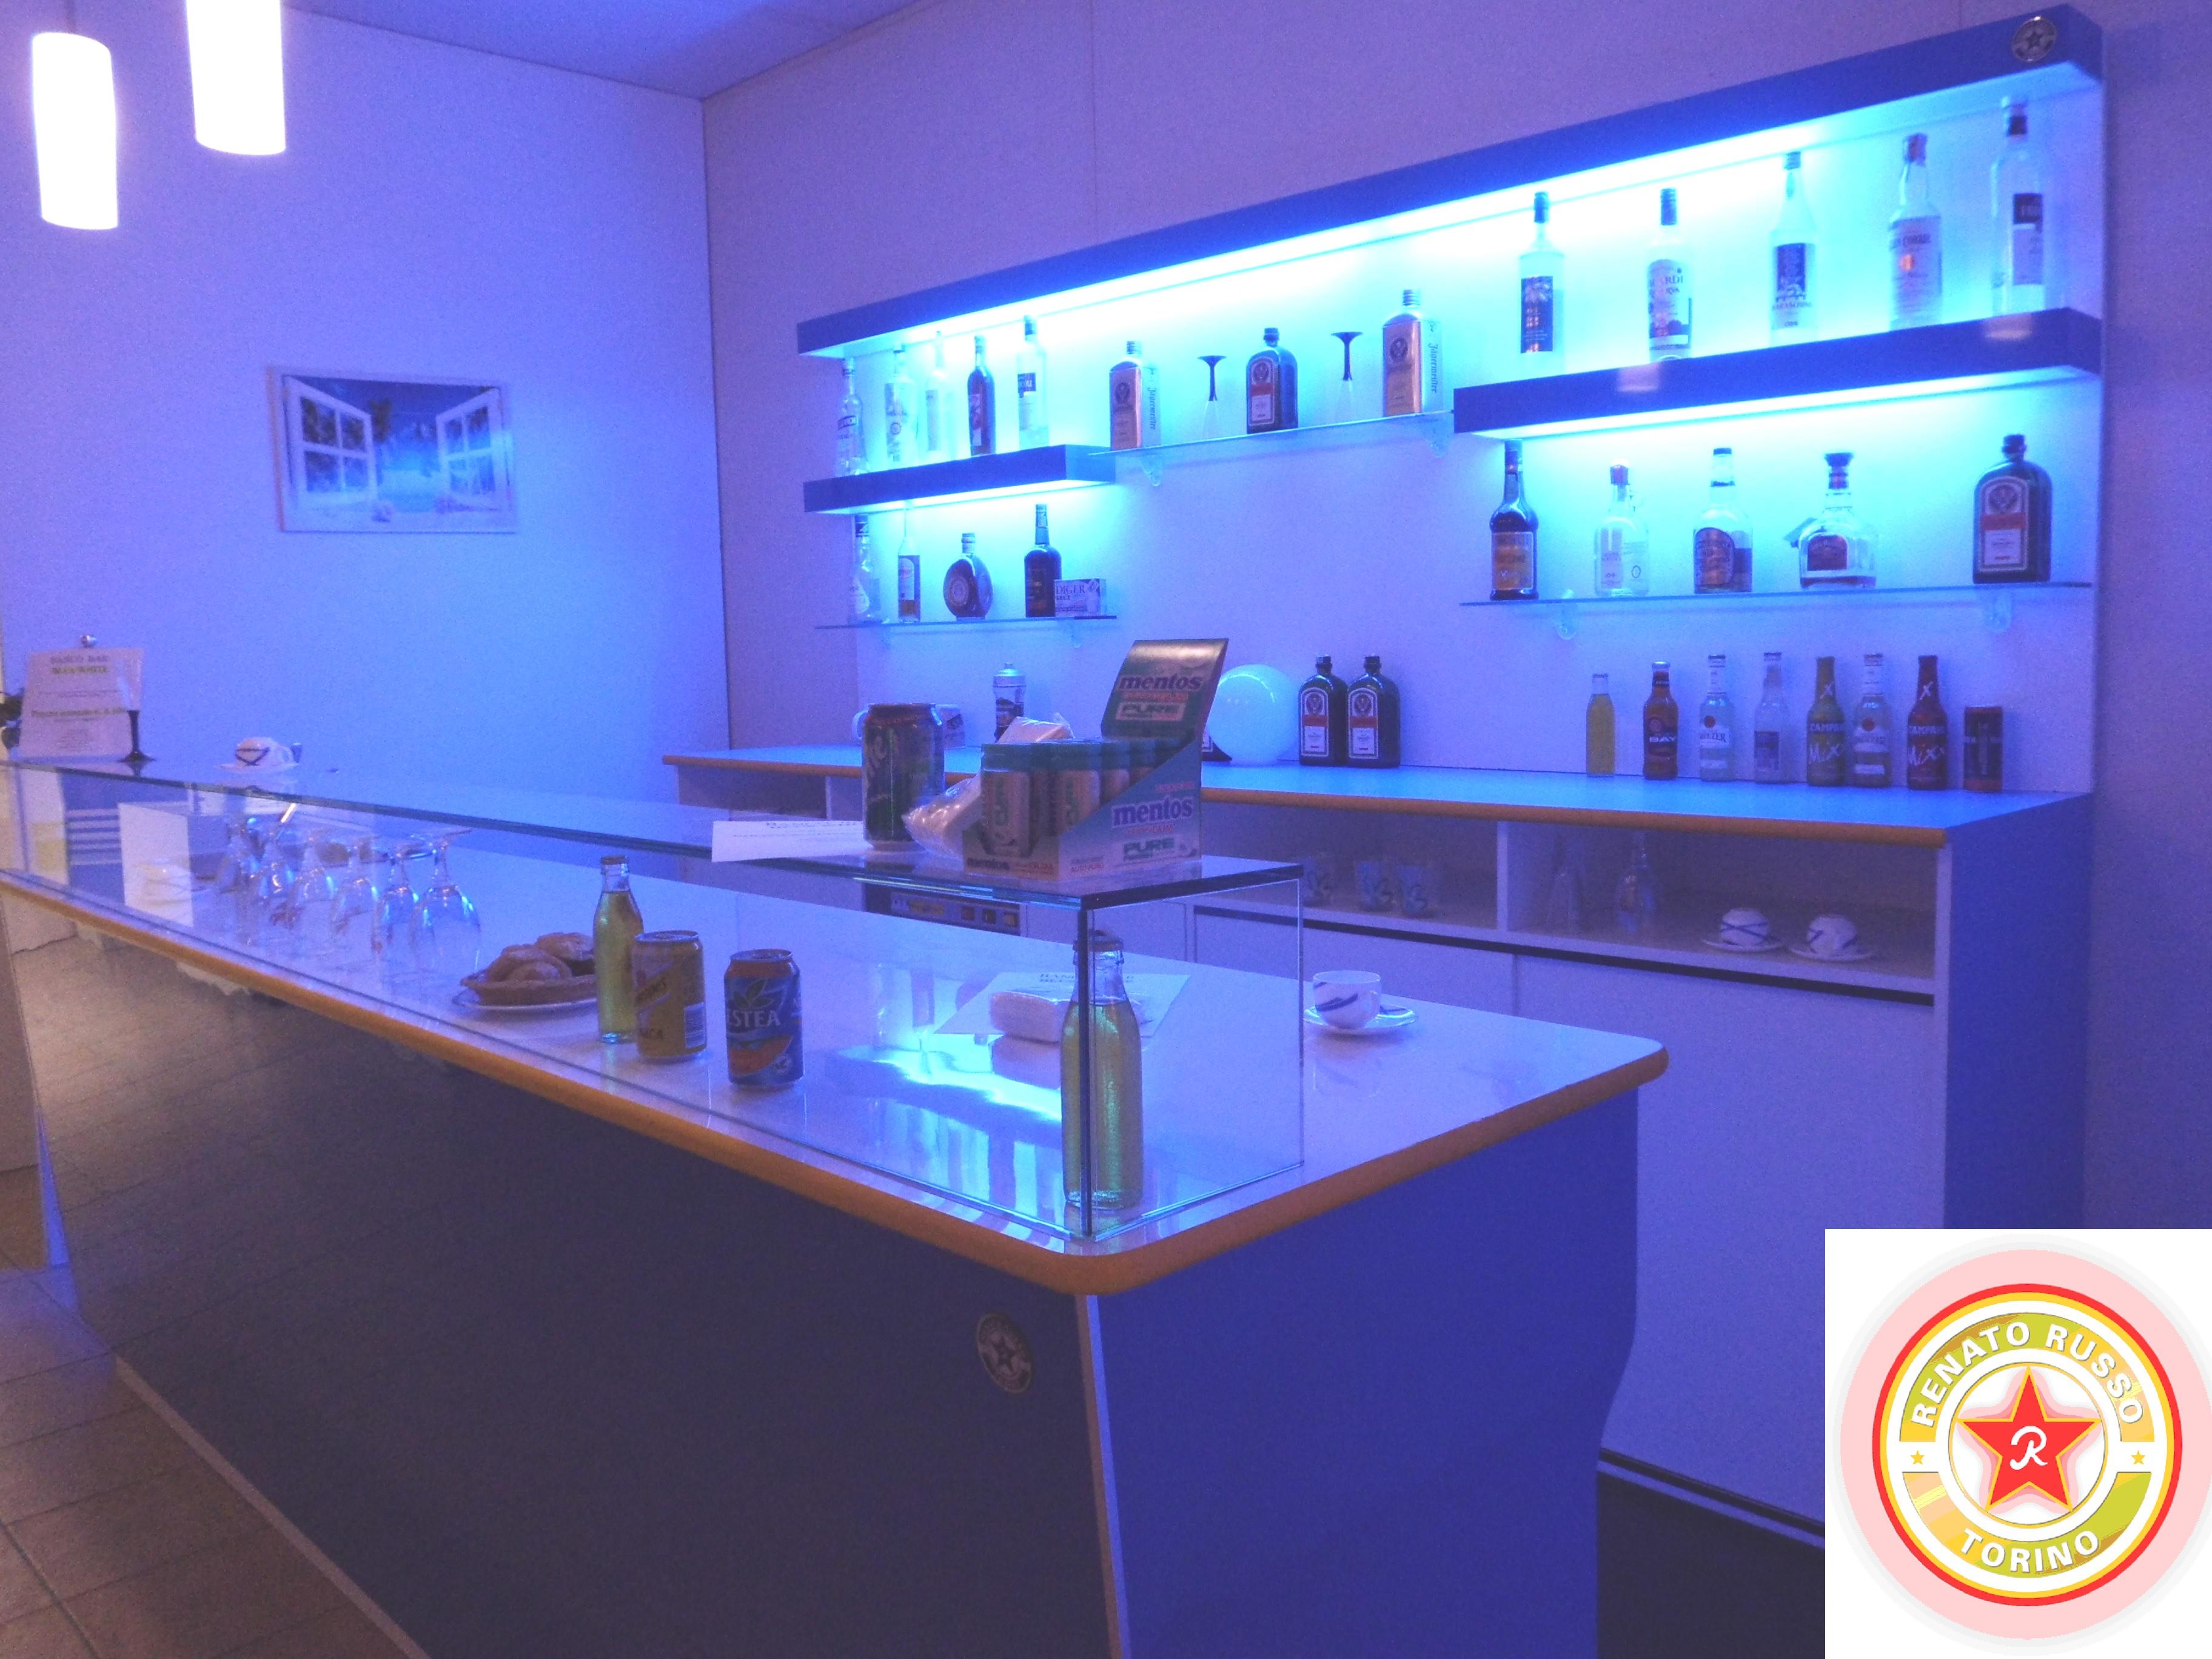 Prezzi banchi bar roma compra in fabbrica banconi bar for Arredi bar usati